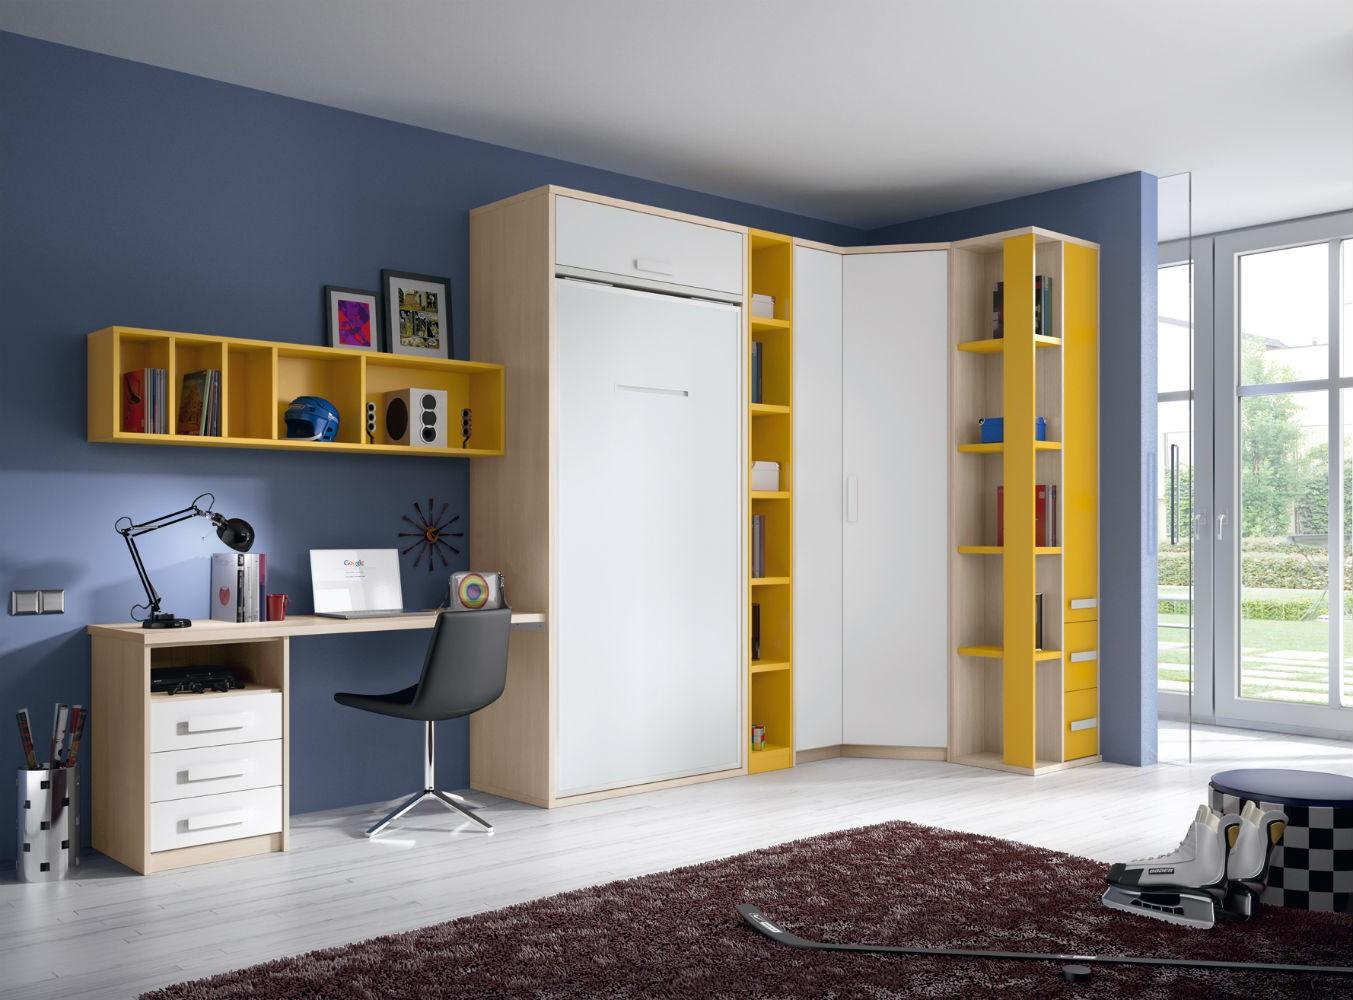 Dormitorio infantil juvenil moderno literas abatibles 69 f224 - Camas abatibles juveniles ...